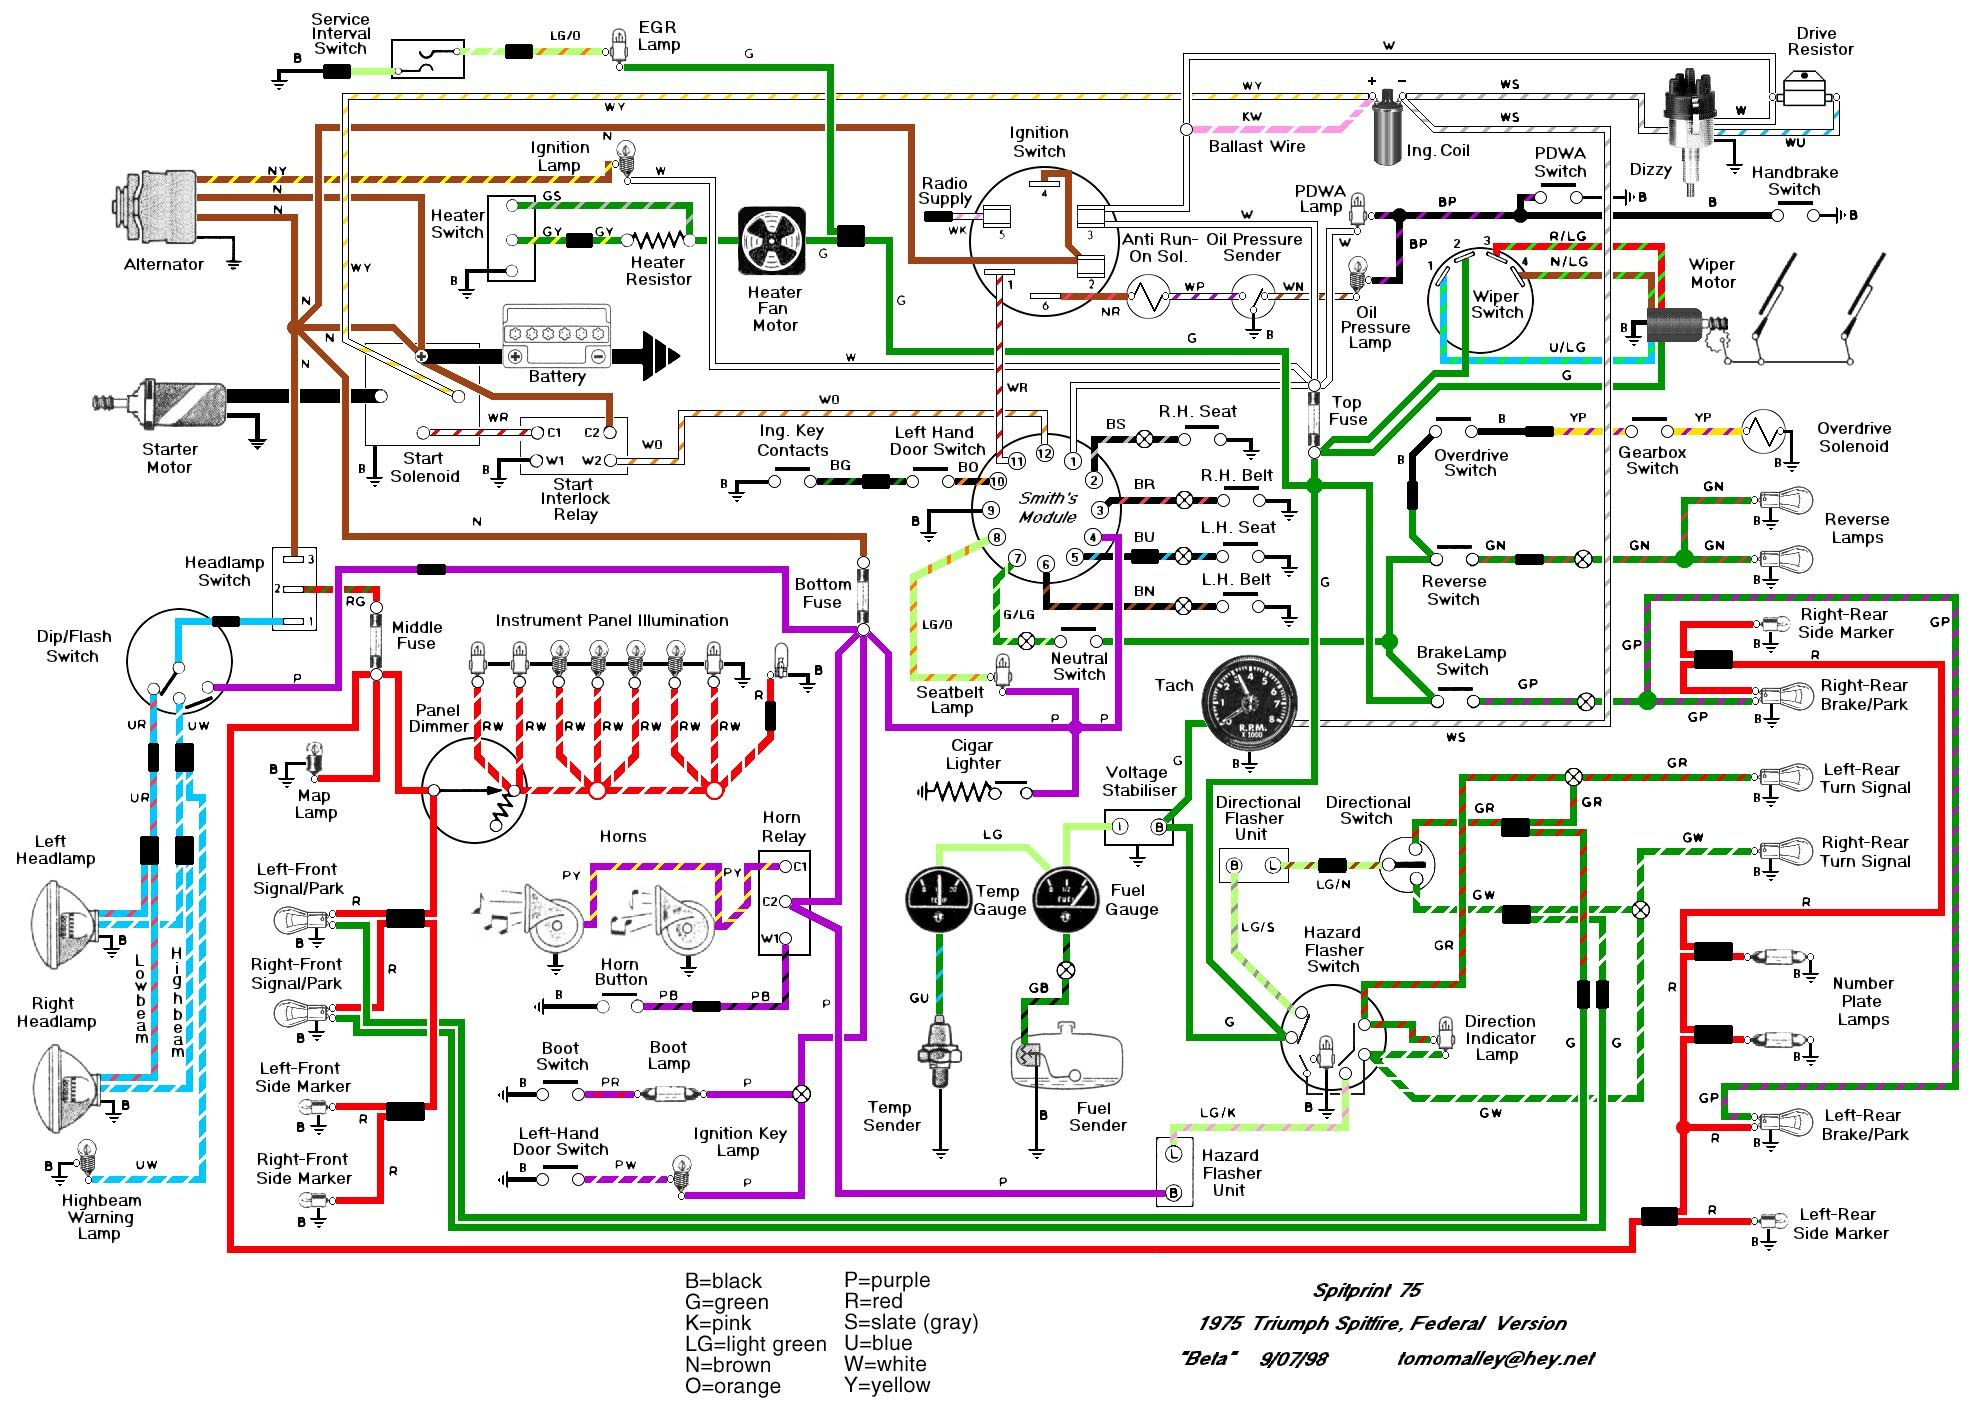 74 Mgb Wiring Diagram - Data Wiring Diagram Schematic - Mgb Wiring Diagram